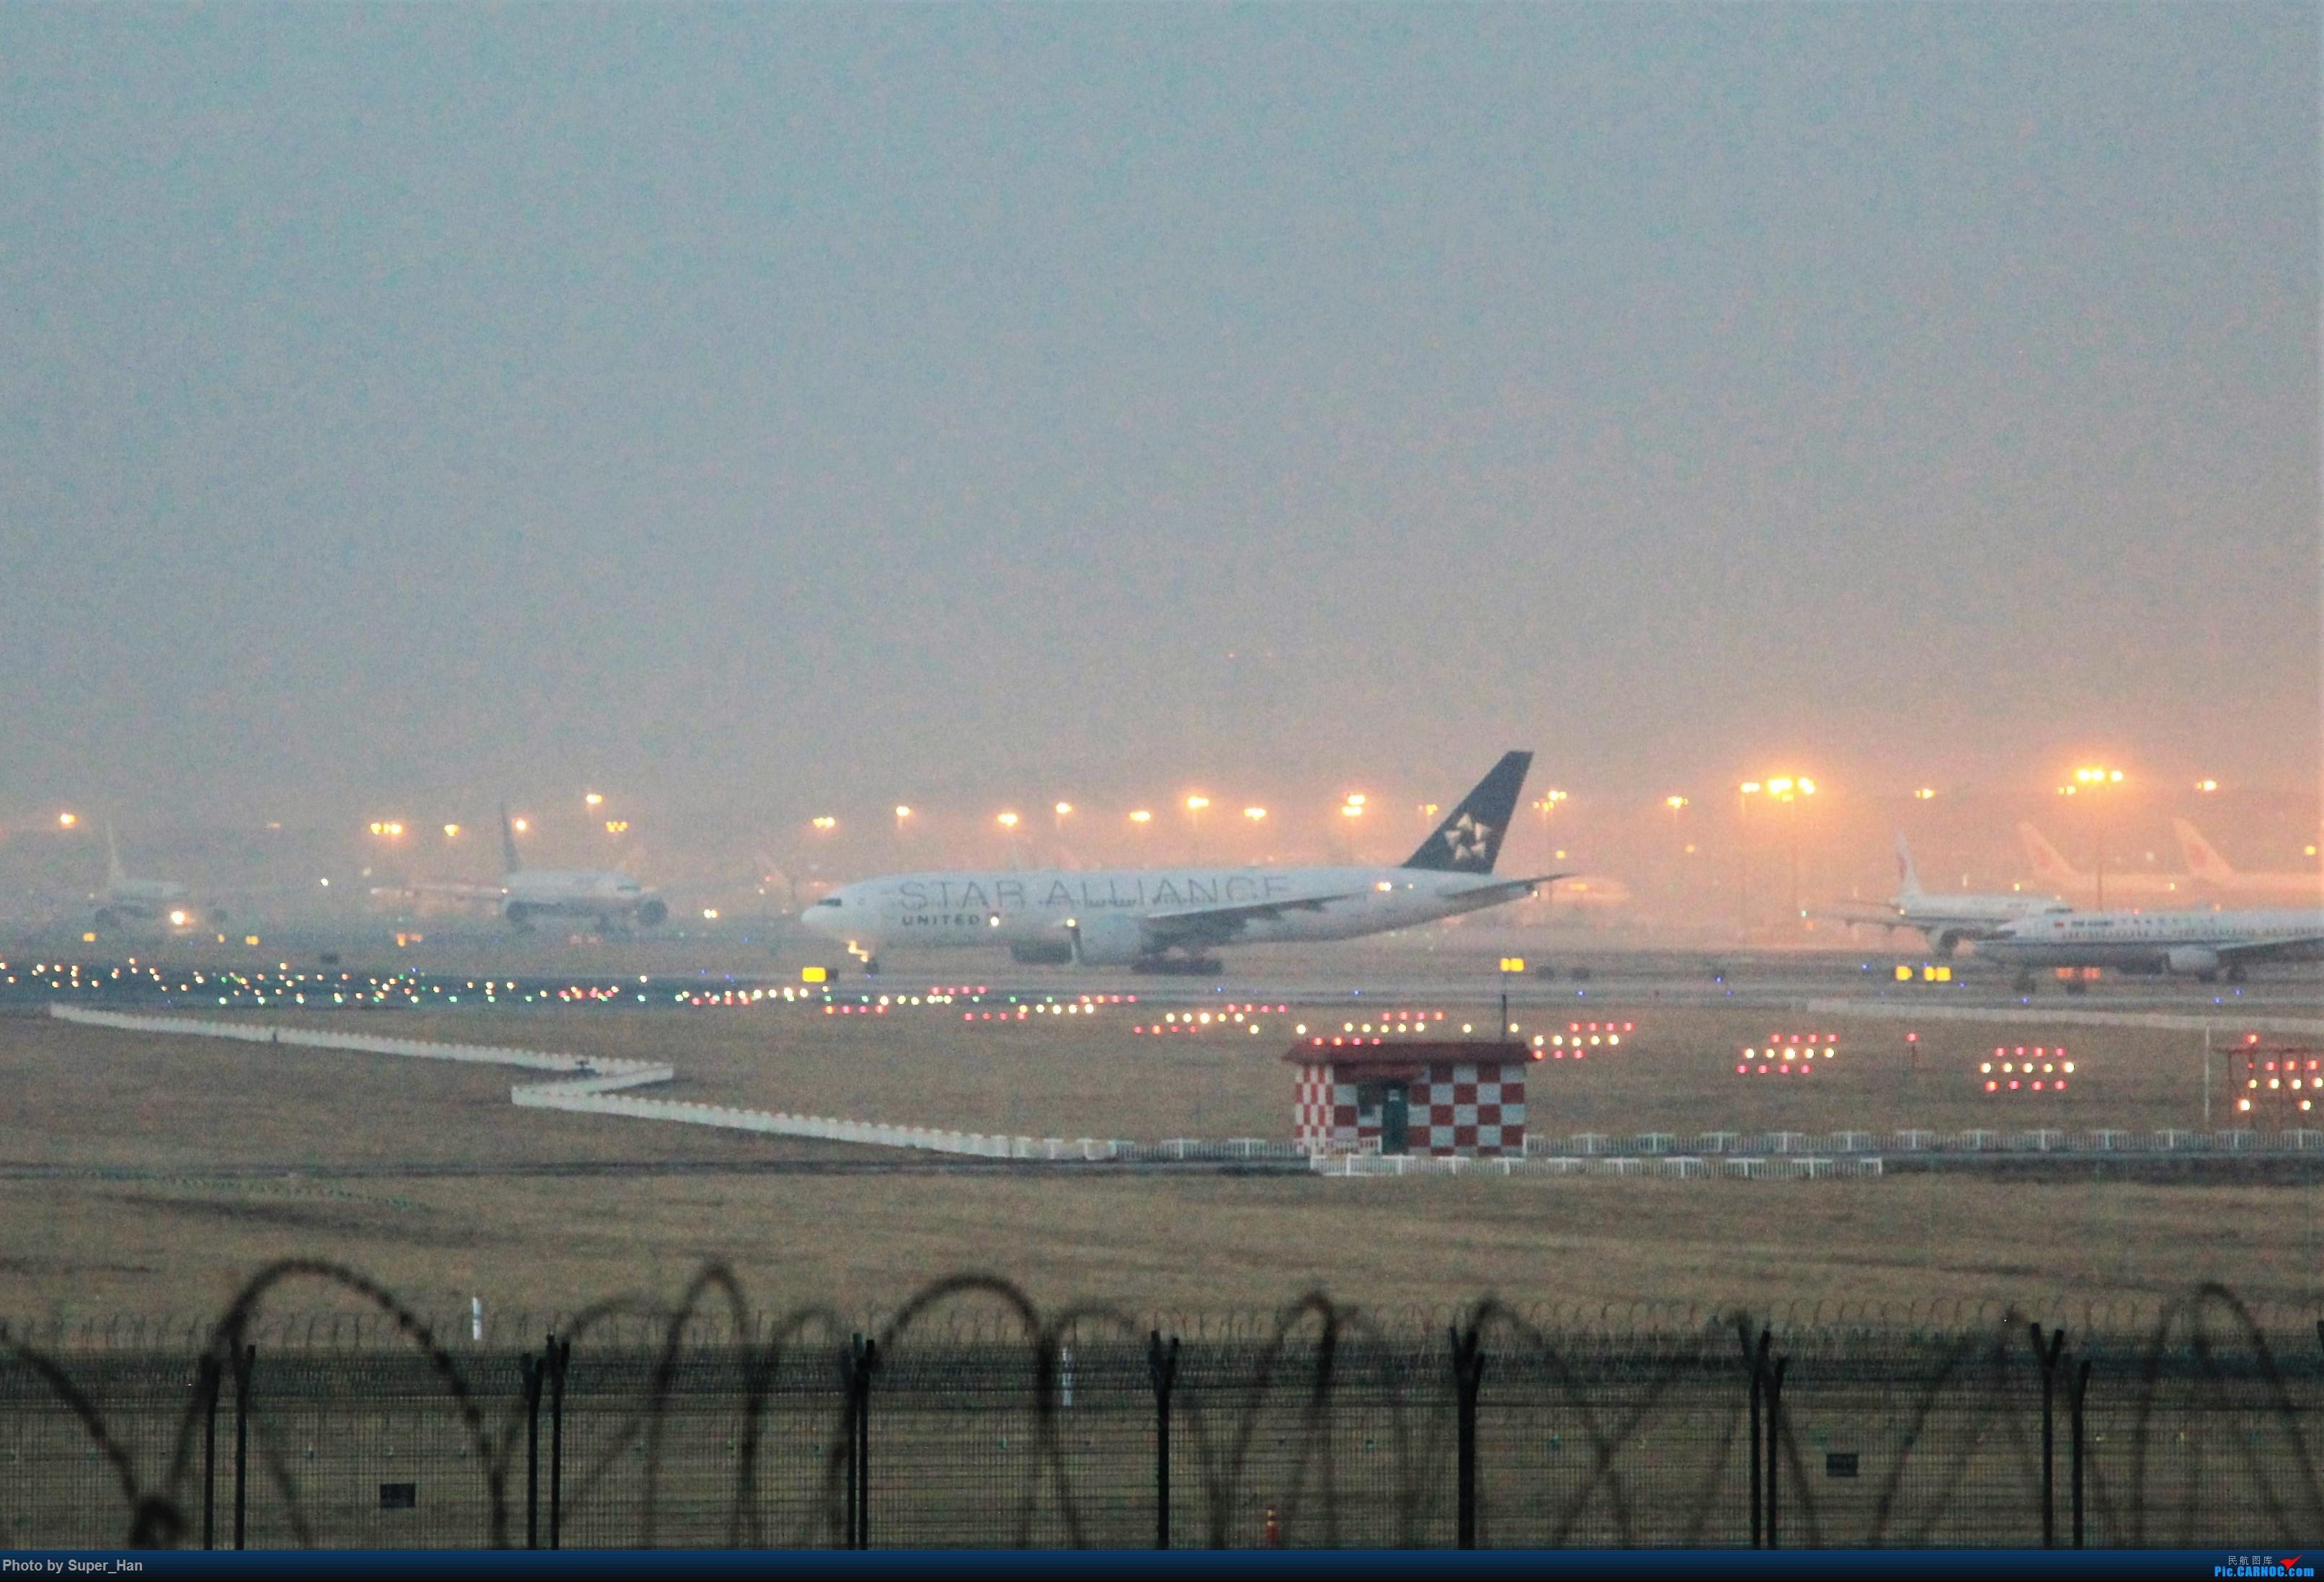 Re:[原创]2019虹桥出发飞北京第一拍 BOEING 777-200ER N794UA 中国北京首都国际机场